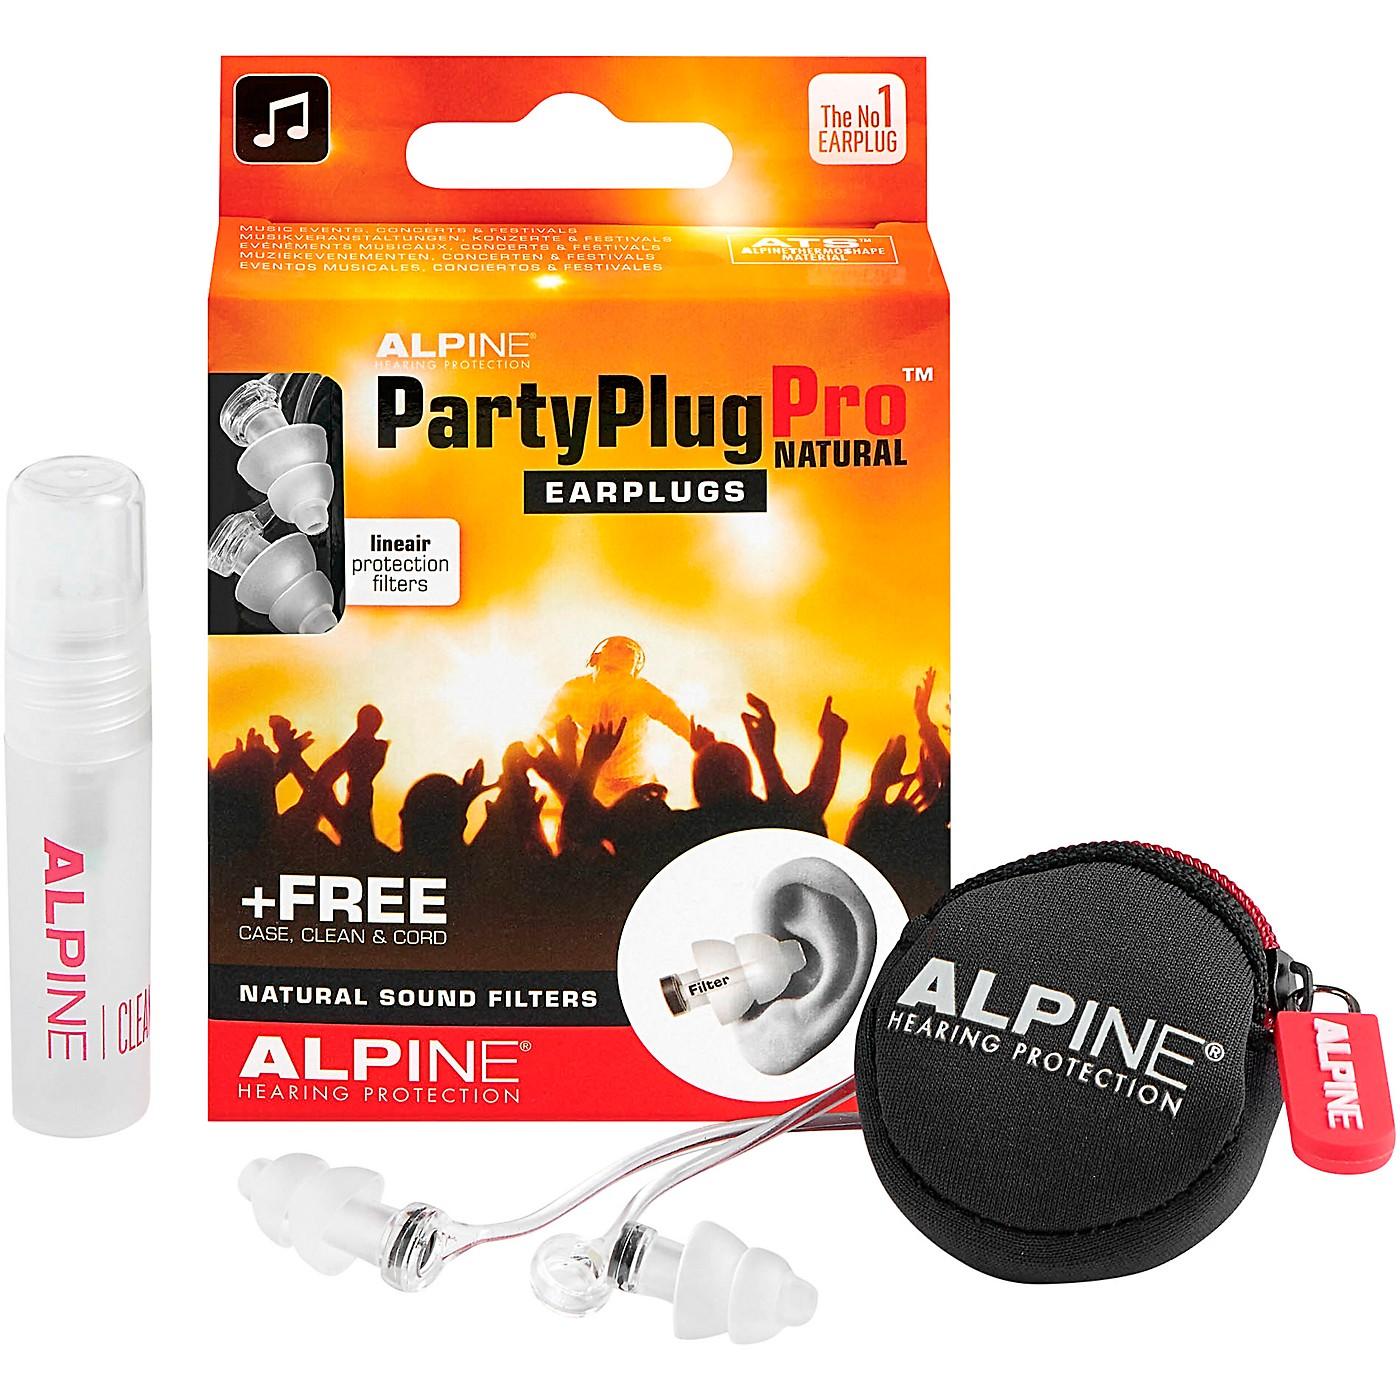 Alpine Hearing Protection PartyPlug Pro Natural Earplugs thumbnail